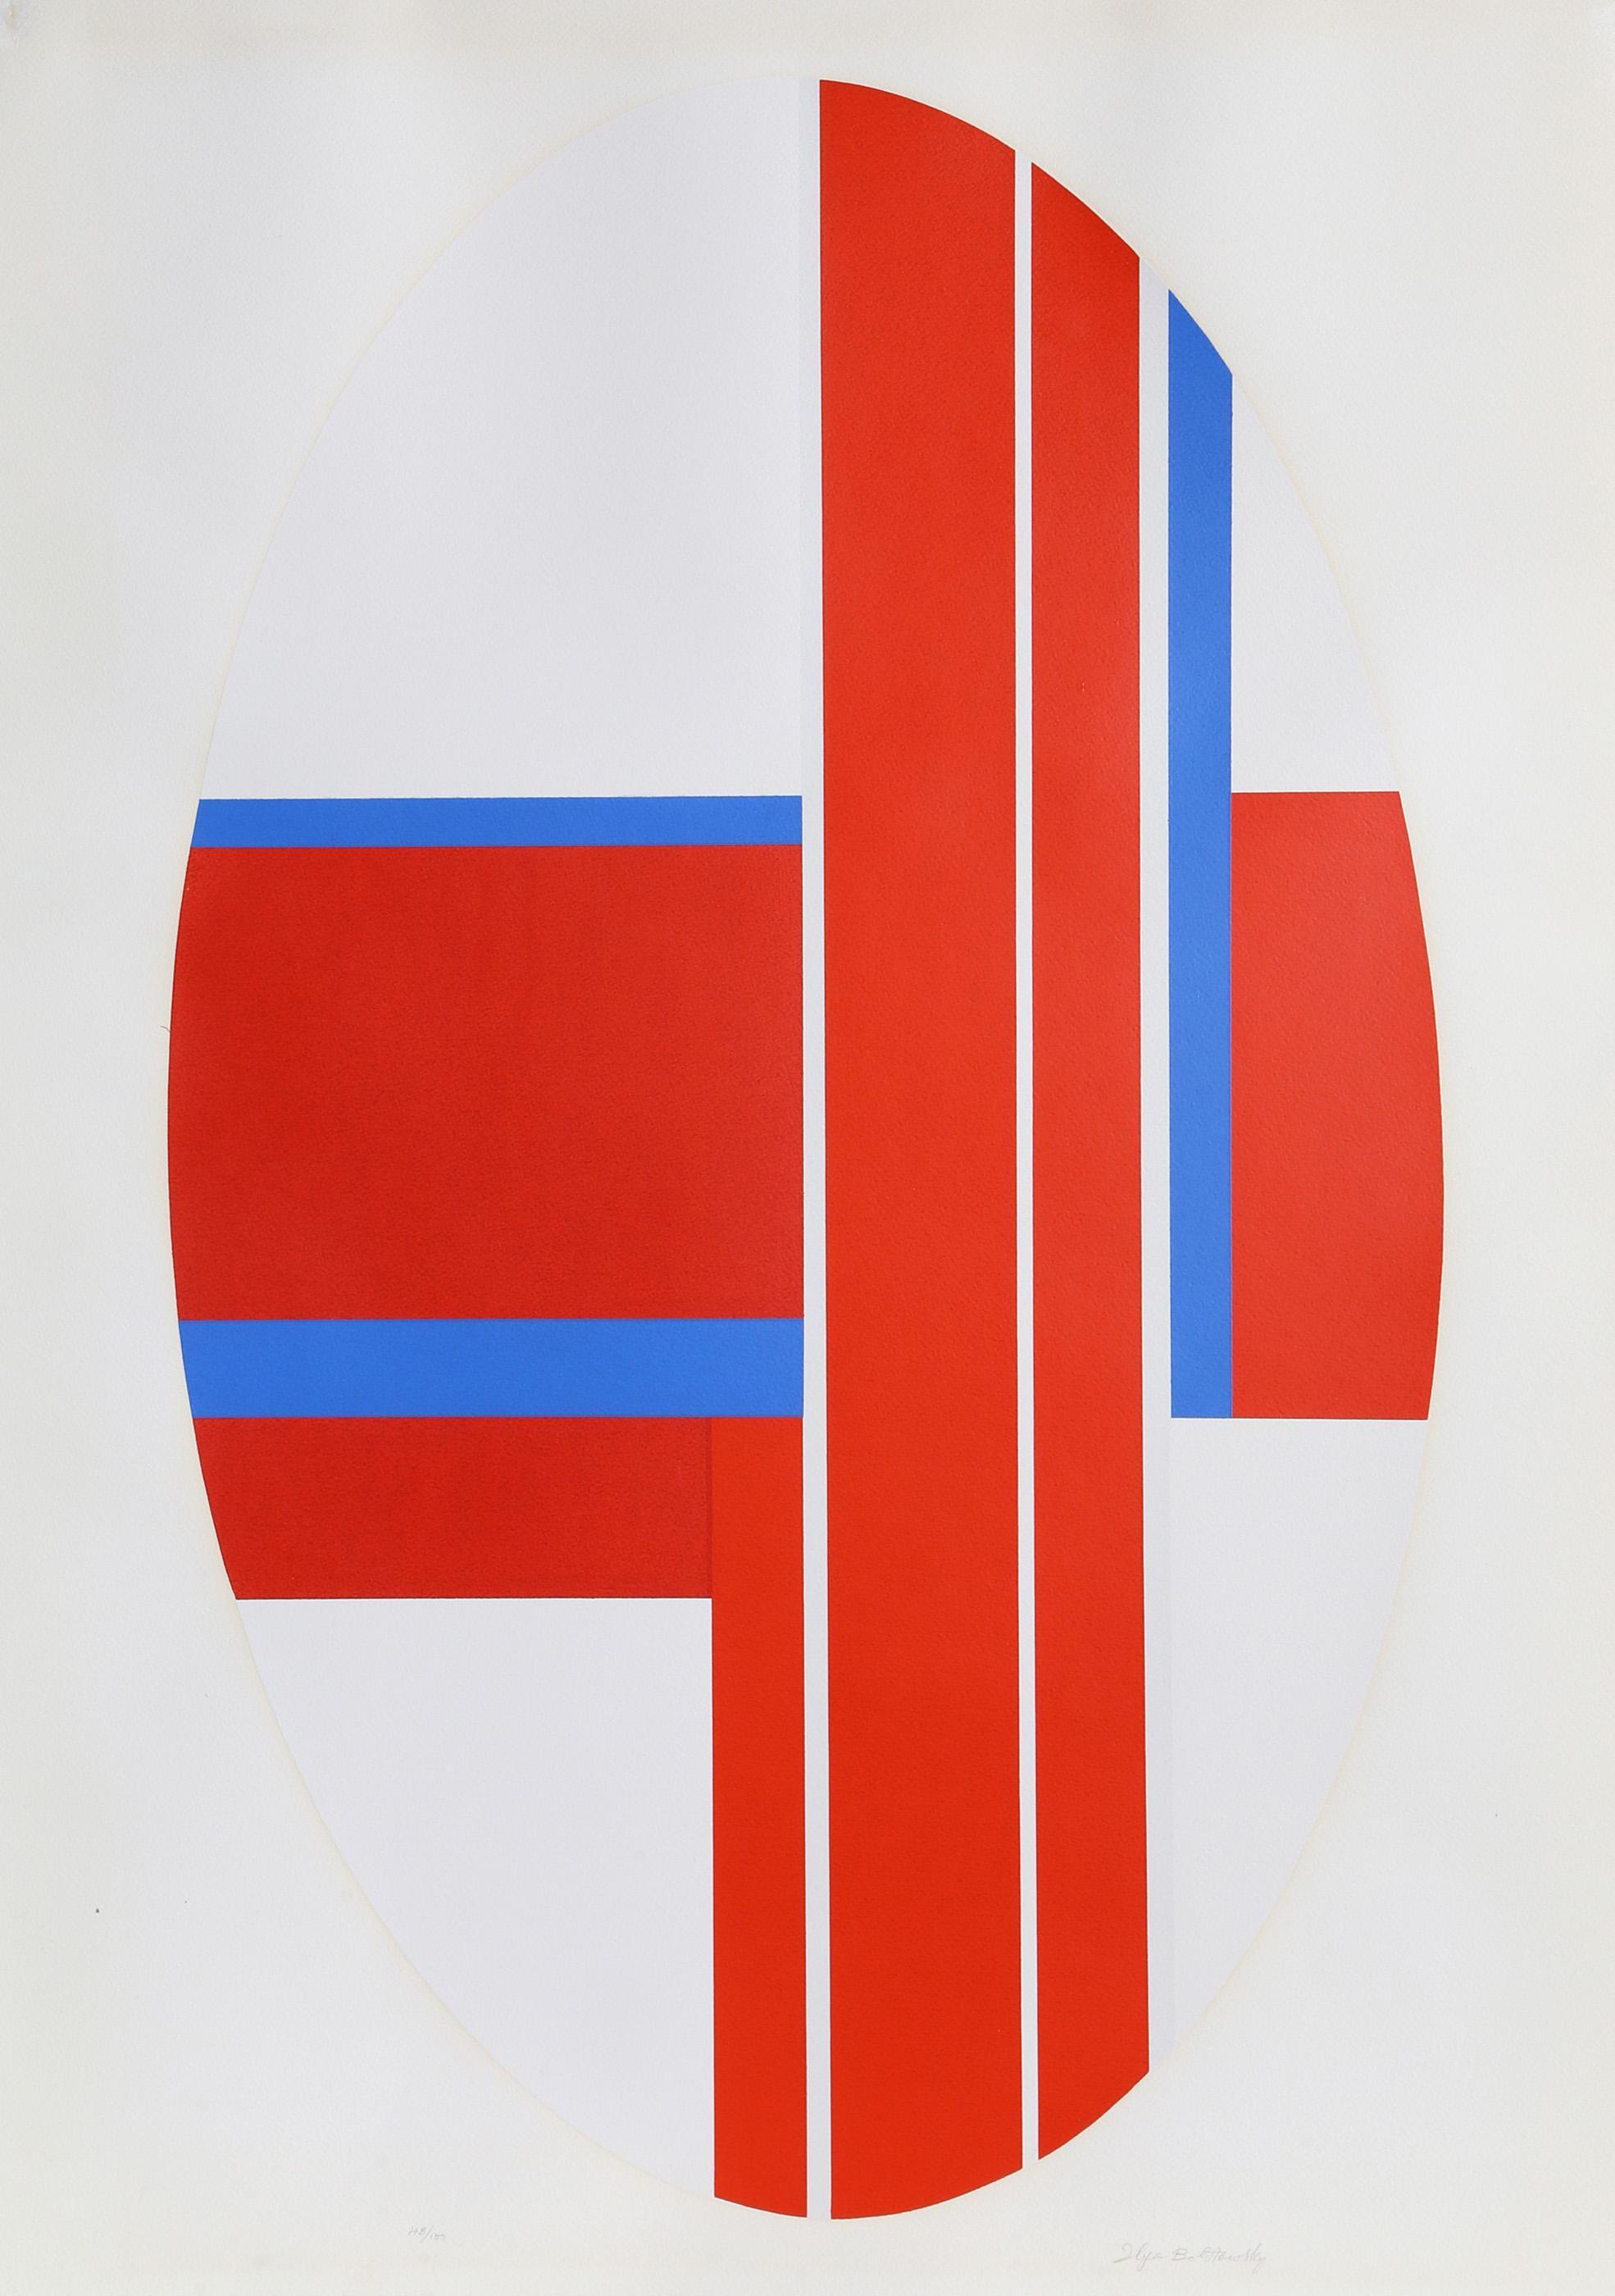 Ilya Bolotowsky, Red Oval Variation 3, Screenprint